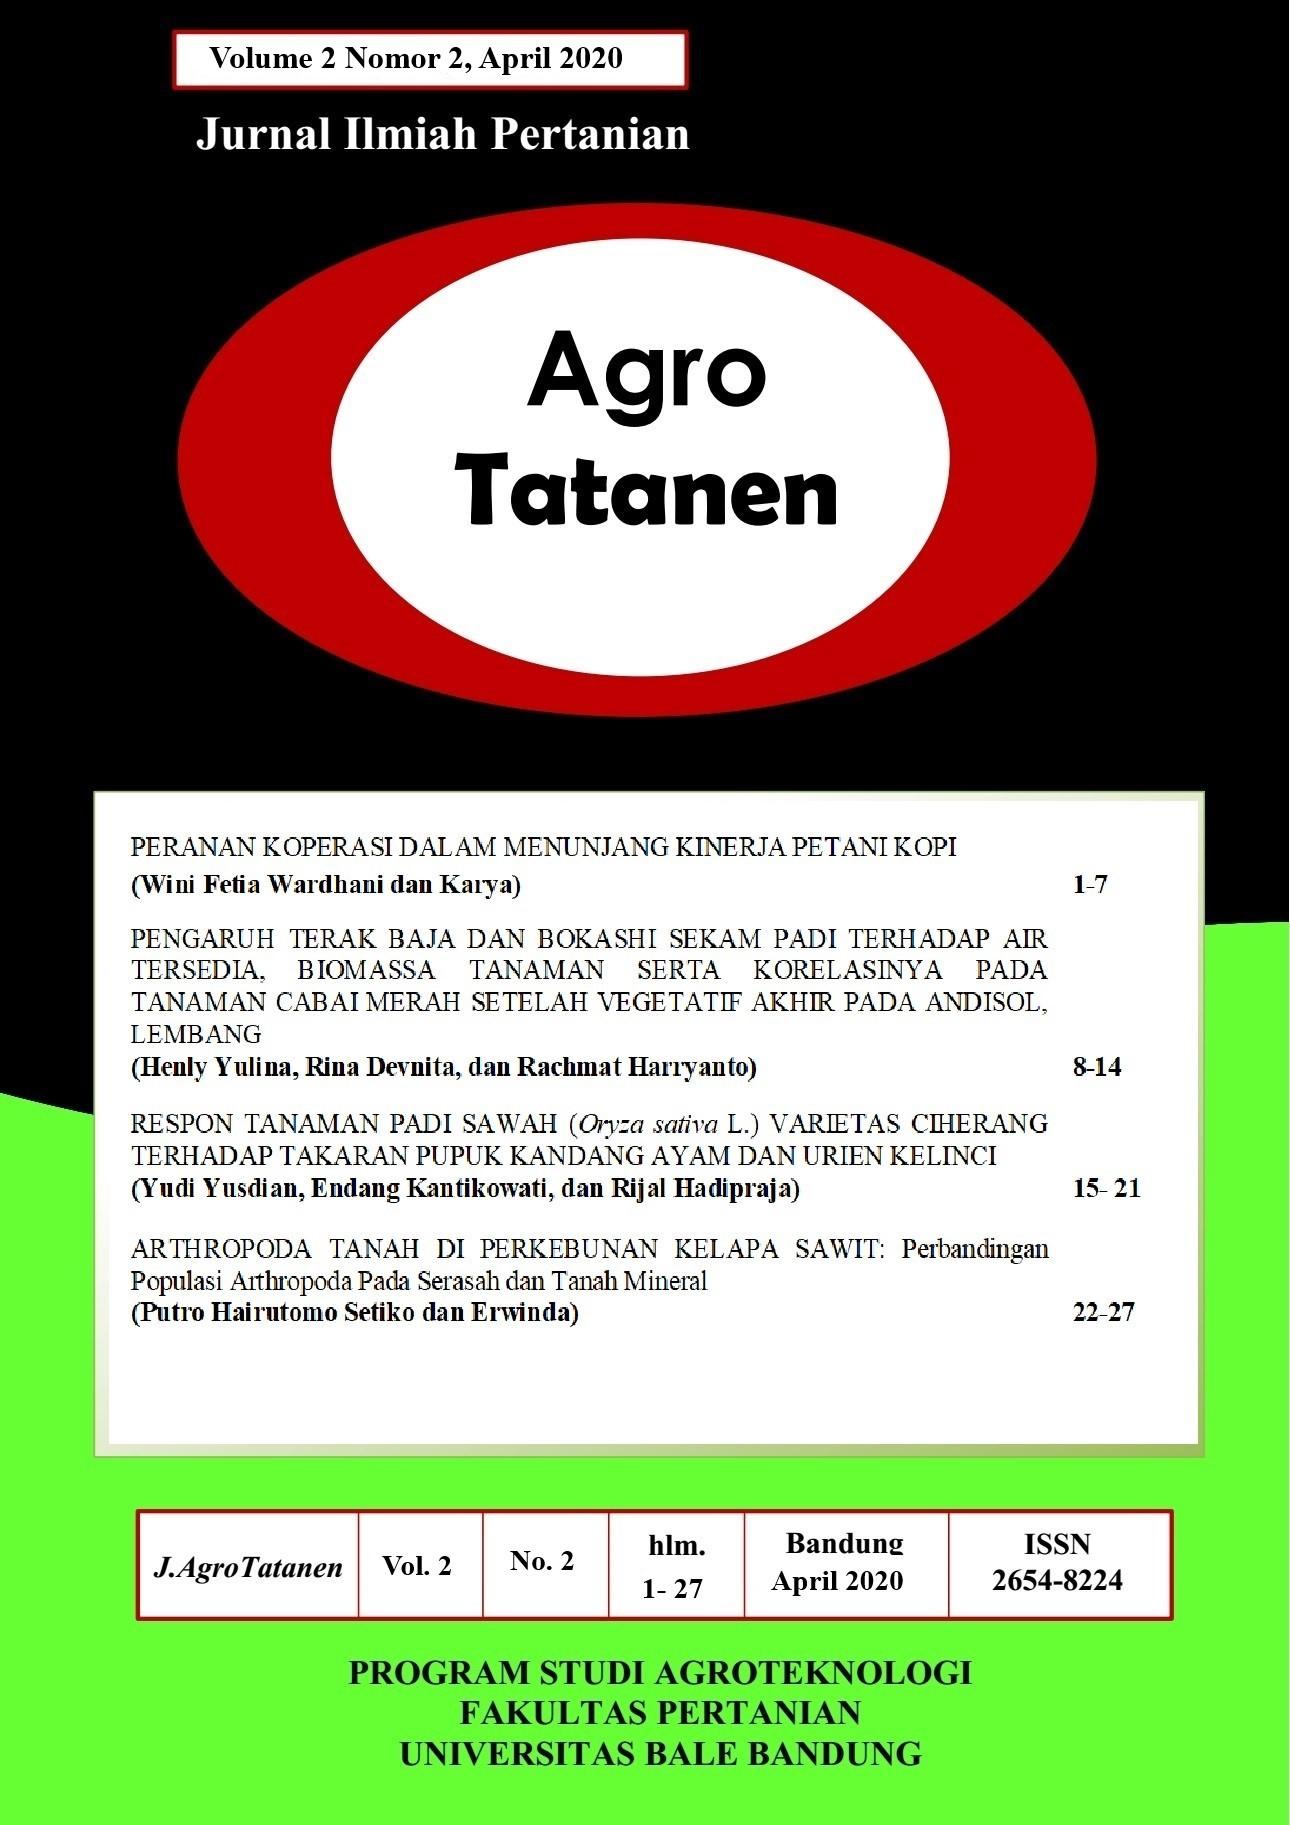 View Vol. 2 No. 2 (2020): AGRO TATANEN Edisi April 2020 | Jurnal Ilmiah Pertanian